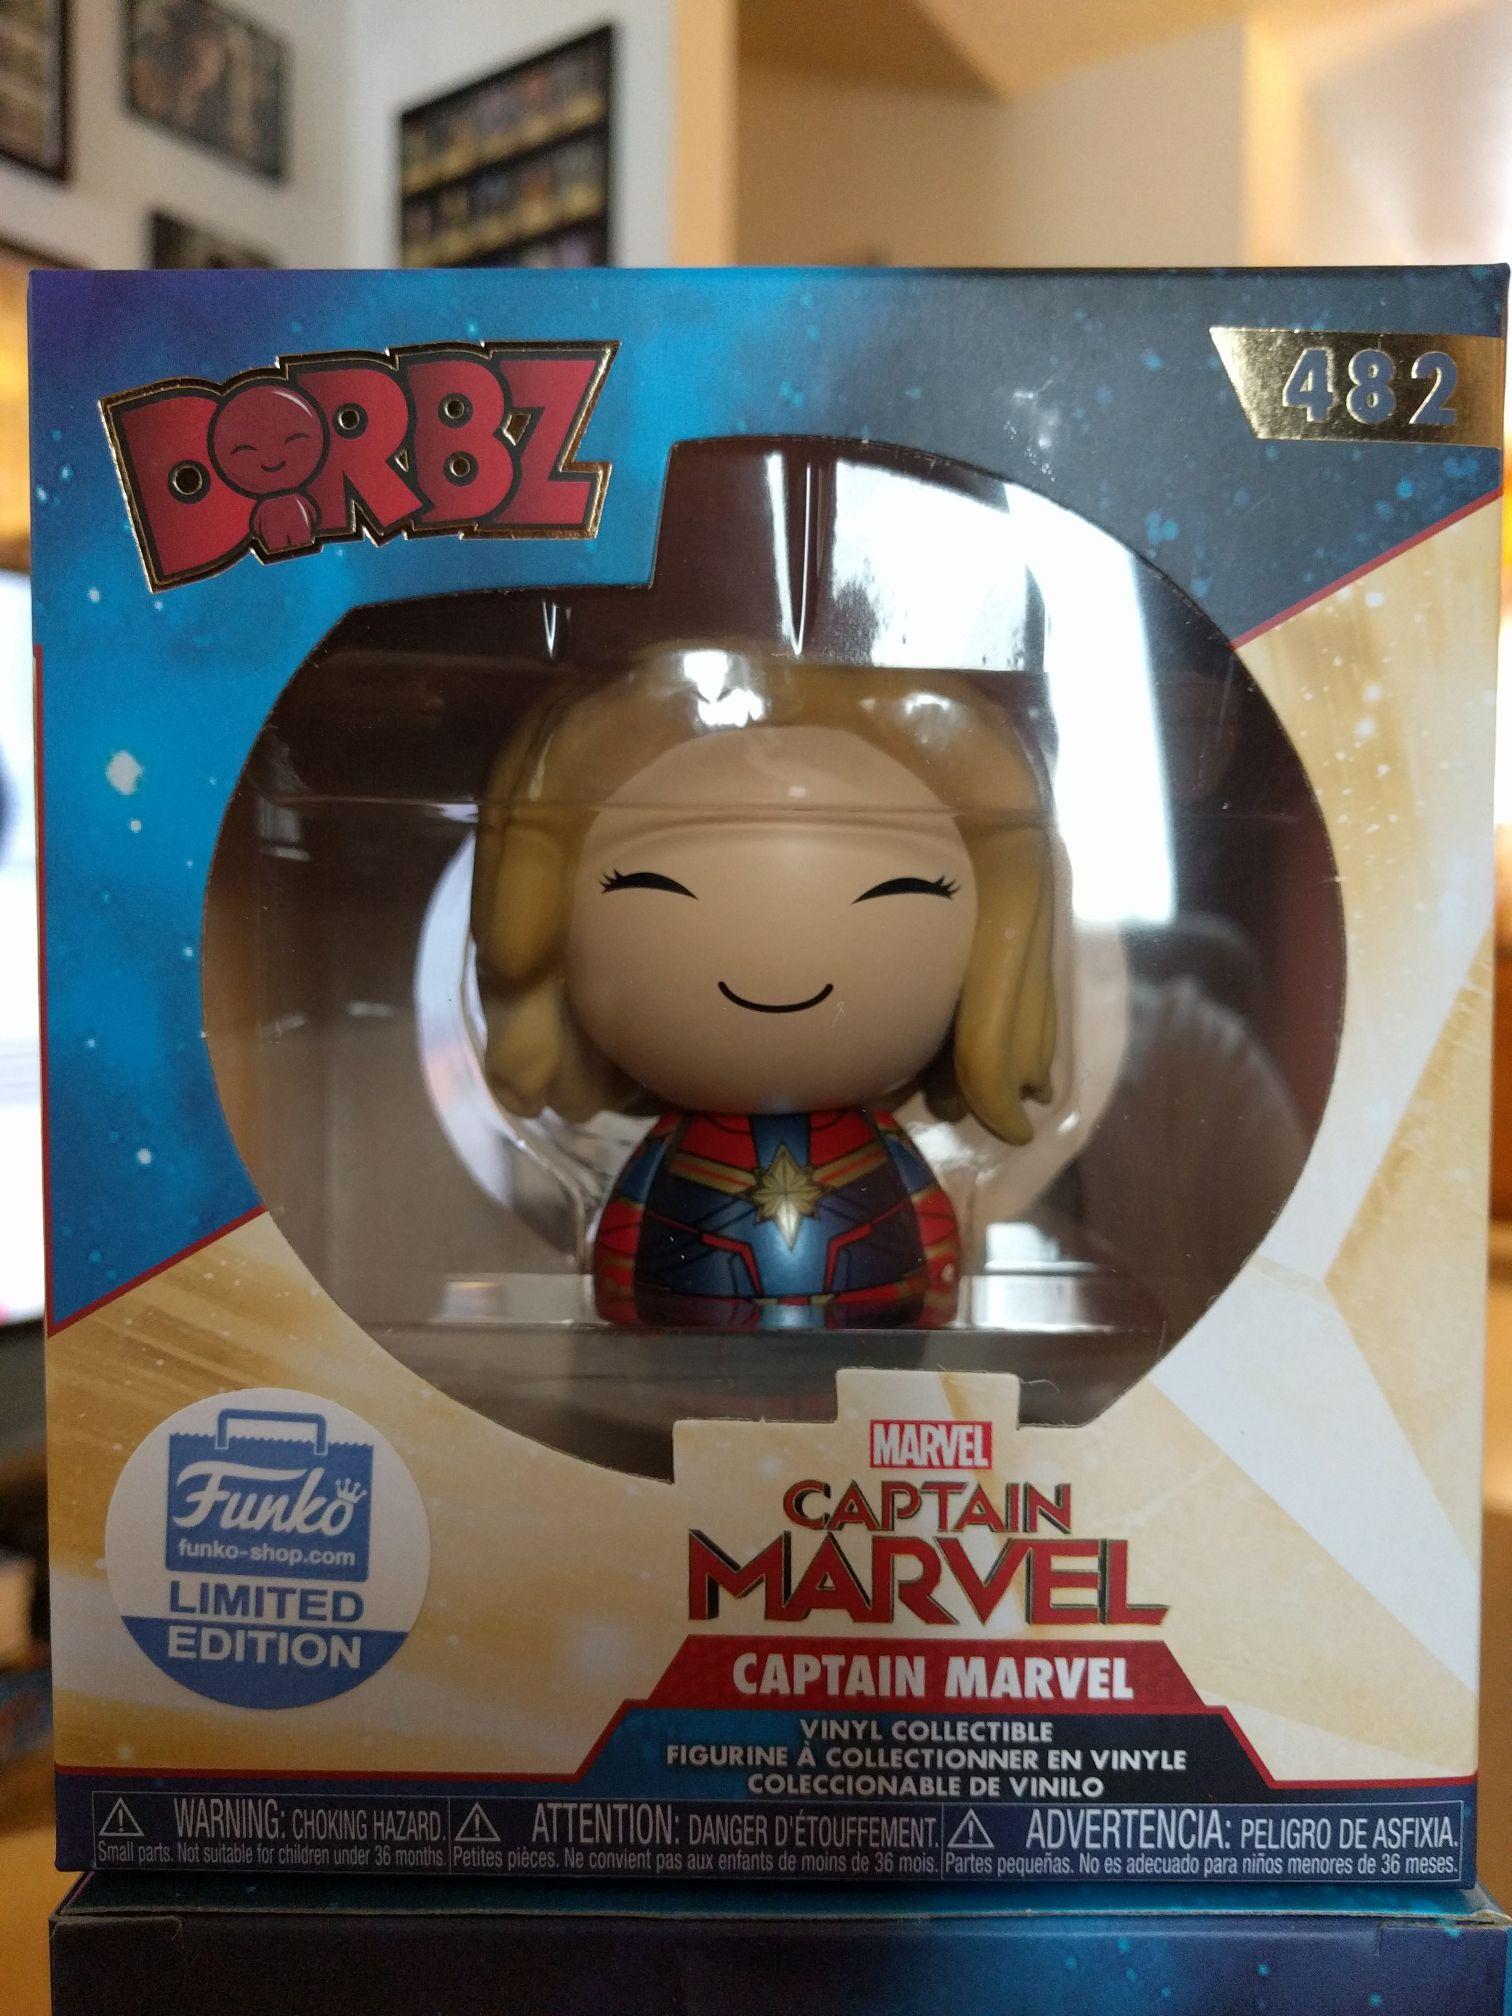 Captain Marvel Funko - Dorbz (482) front image (front cover)